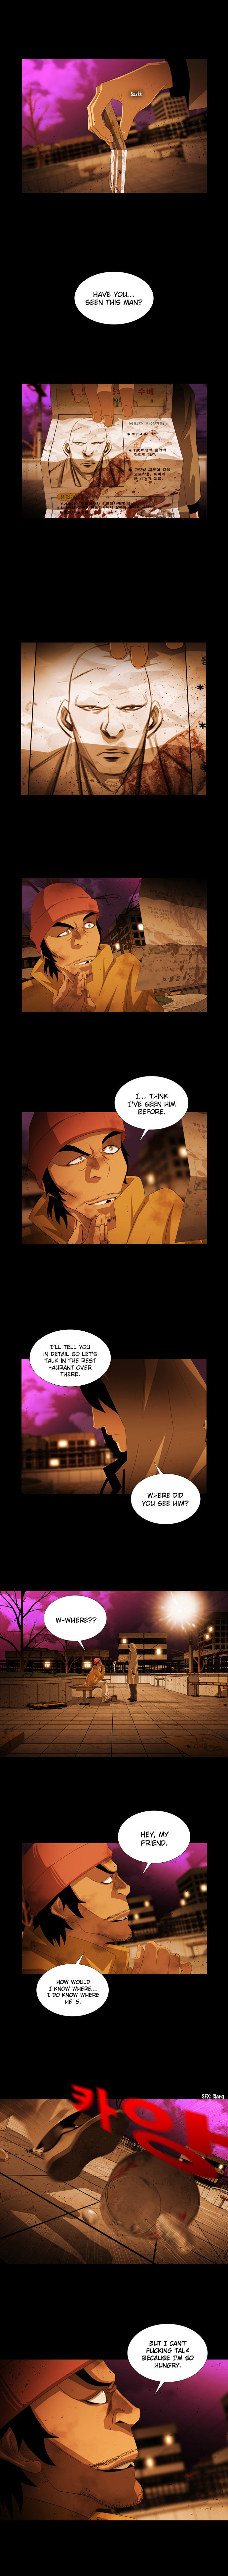 Marionette (WOO Kang-Sik) 20 Page 2